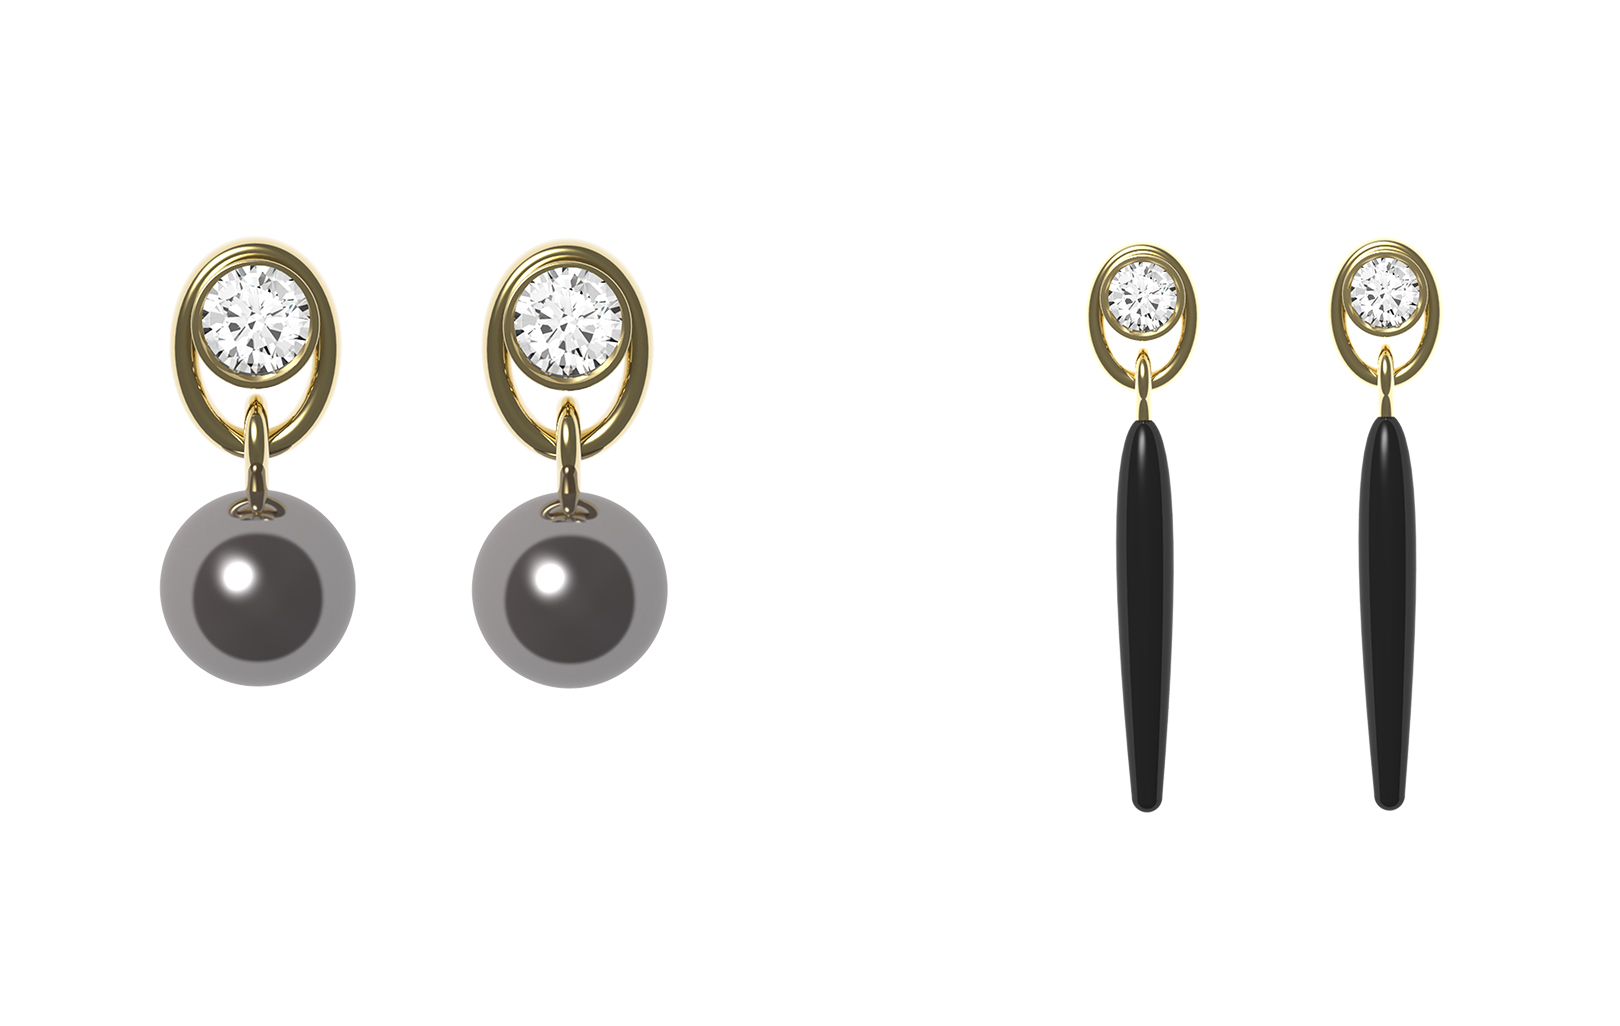 Oval earrings accessory options